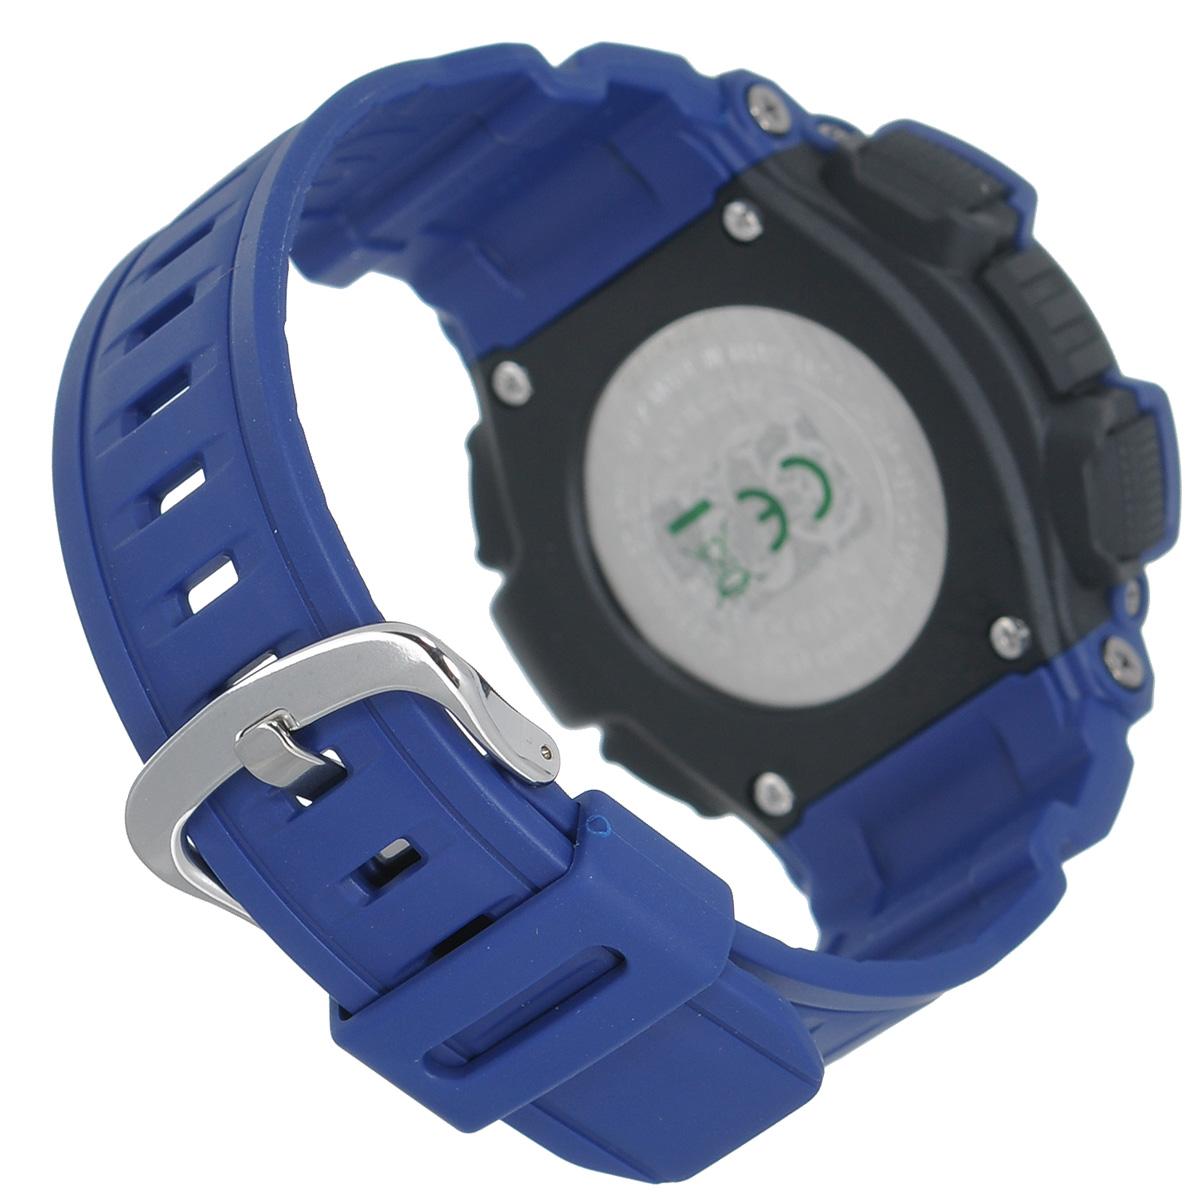 "Часы мужские наручные Casio ""G-Shock"", цвет: синий. G-9300NV-2E ( G-9300NV-2E )"